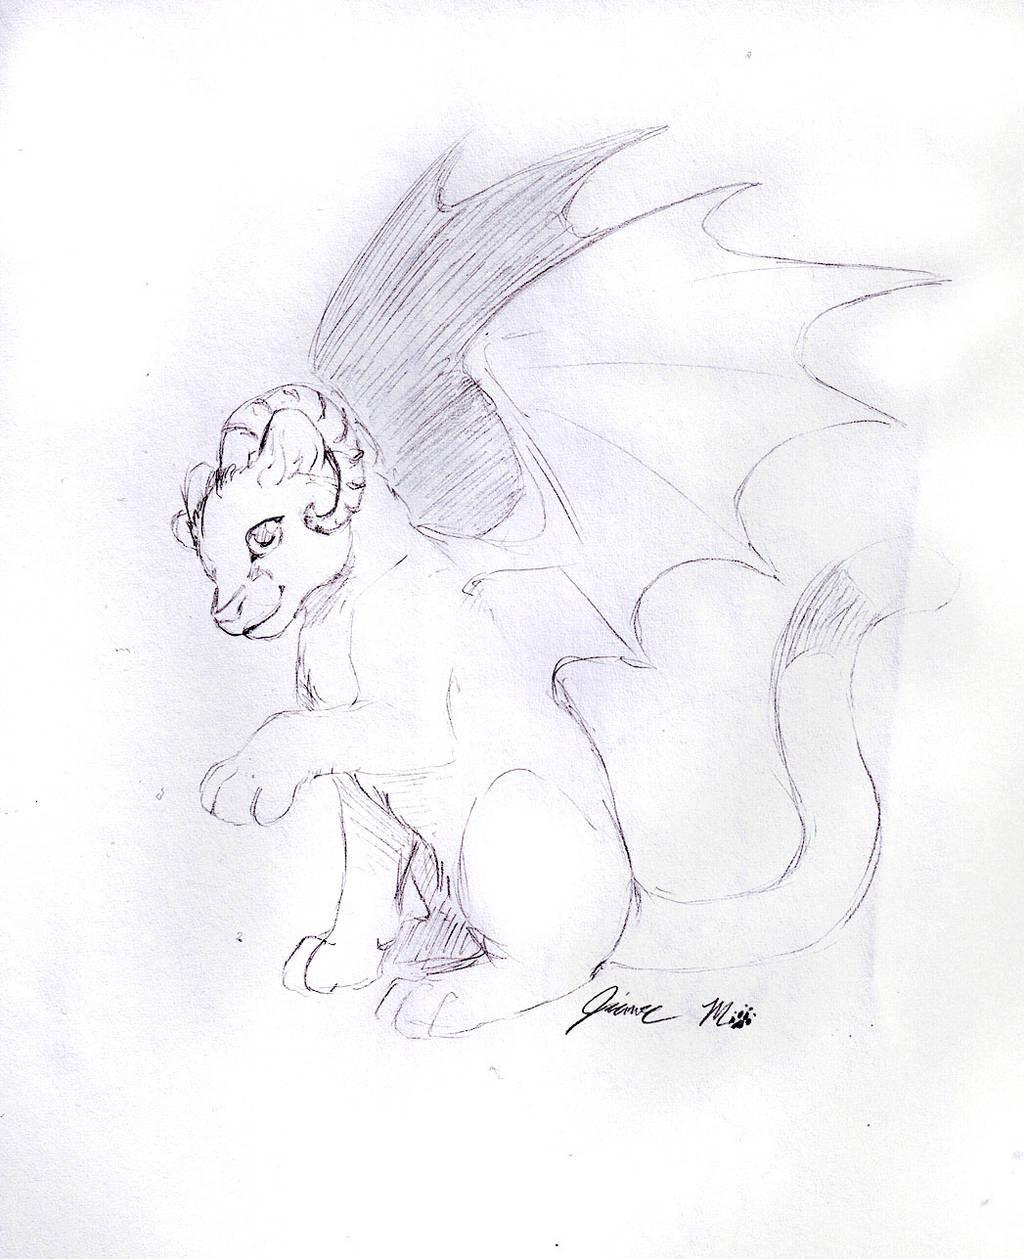 Sketch Request - Demon Cougar by Jianre-M